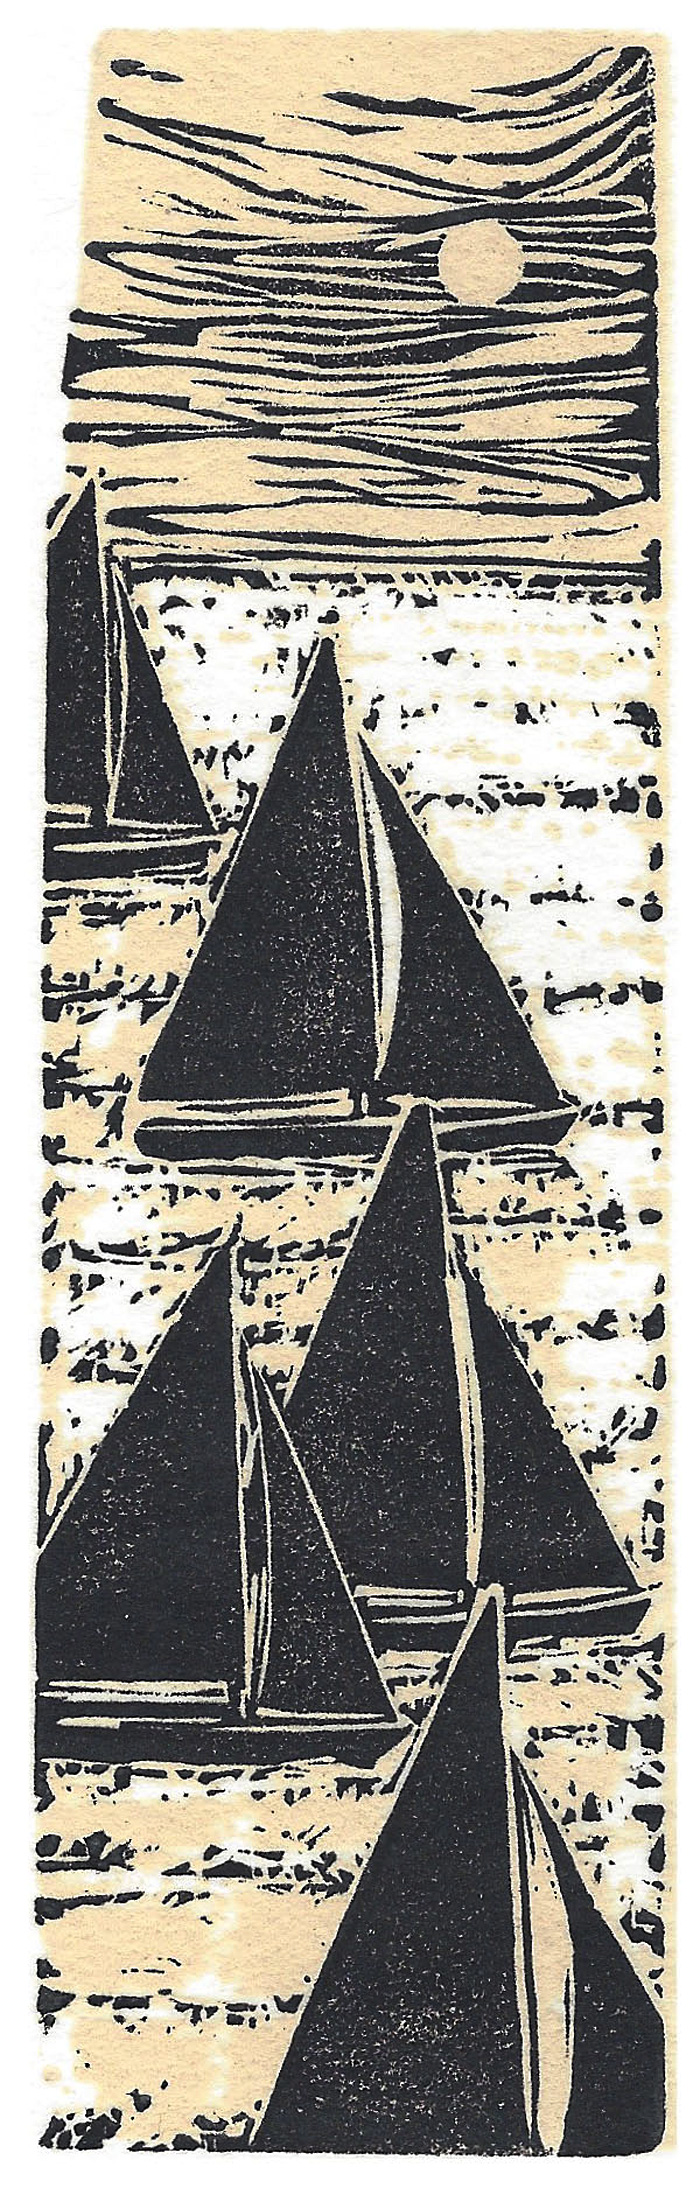 Sailing-Sketch-yellow